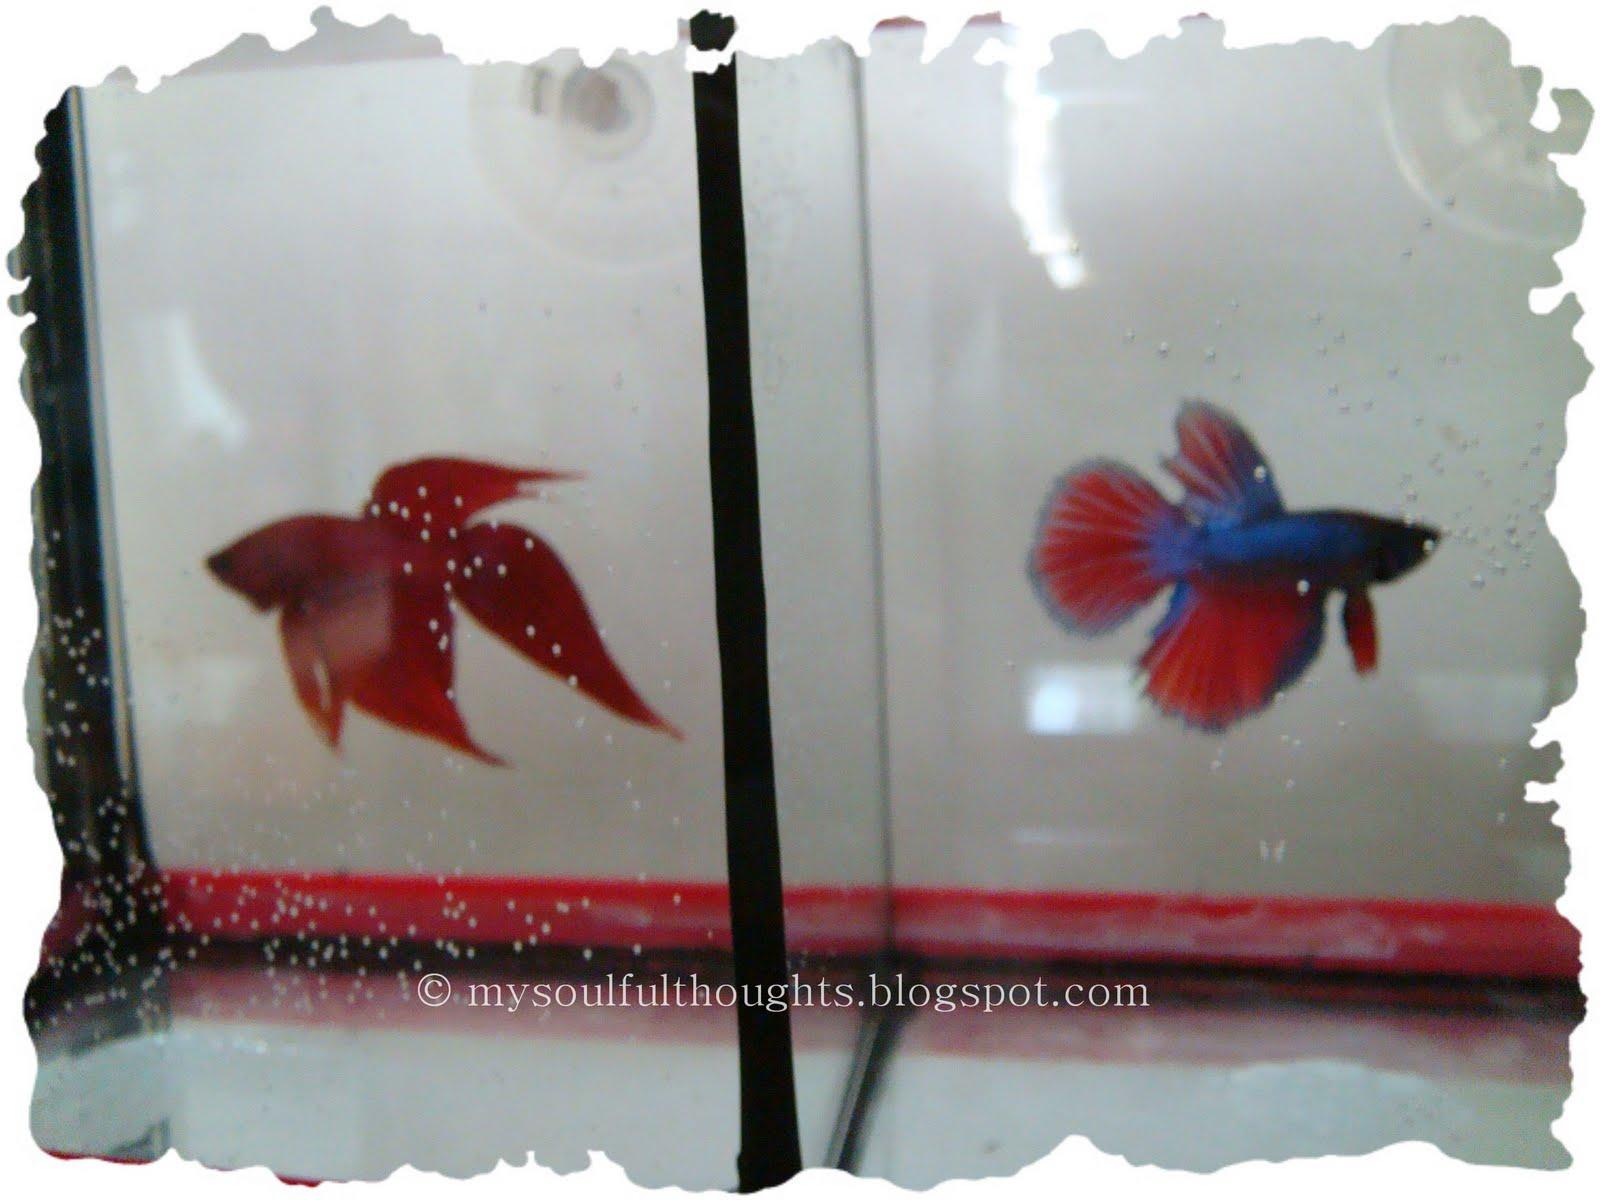 http://1.bp.blogspot.com/_S4L6AhIXYXk/TAm8G5FmzsI/AAAAAAAAGqM/G0U_Zd9EYY4/s1600/betta%2Bfish.jpg